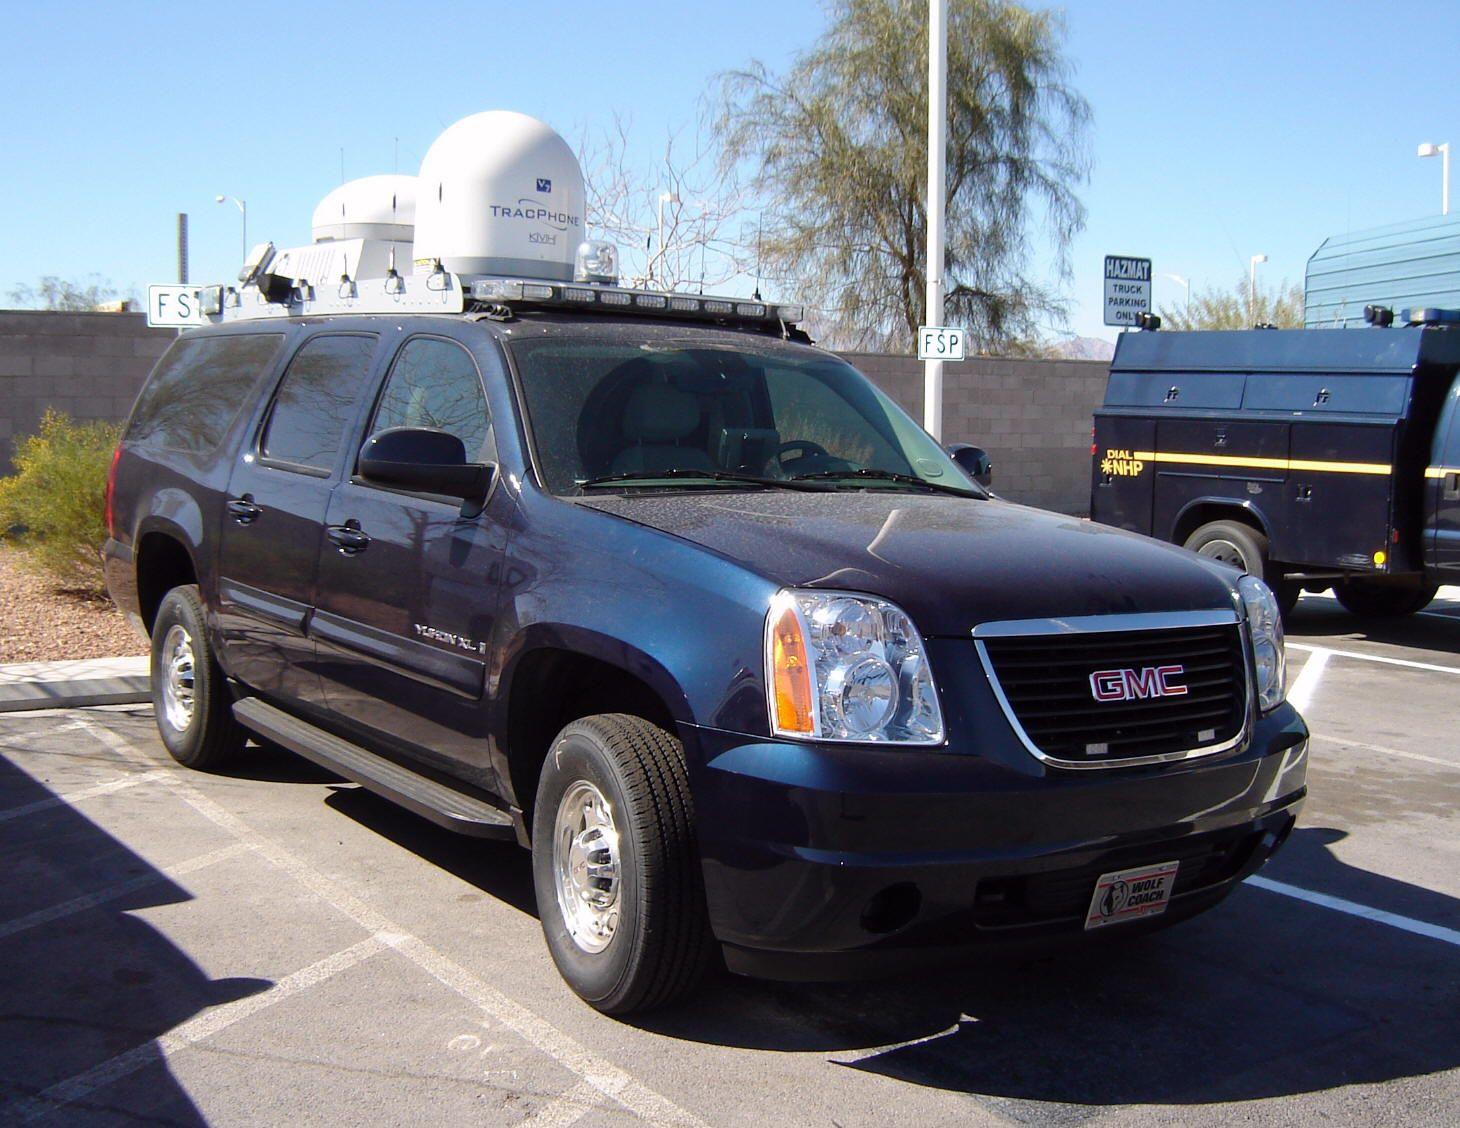 Nevada Highway Patrol 2008 Gmc Yukon Unmarked Command Unit